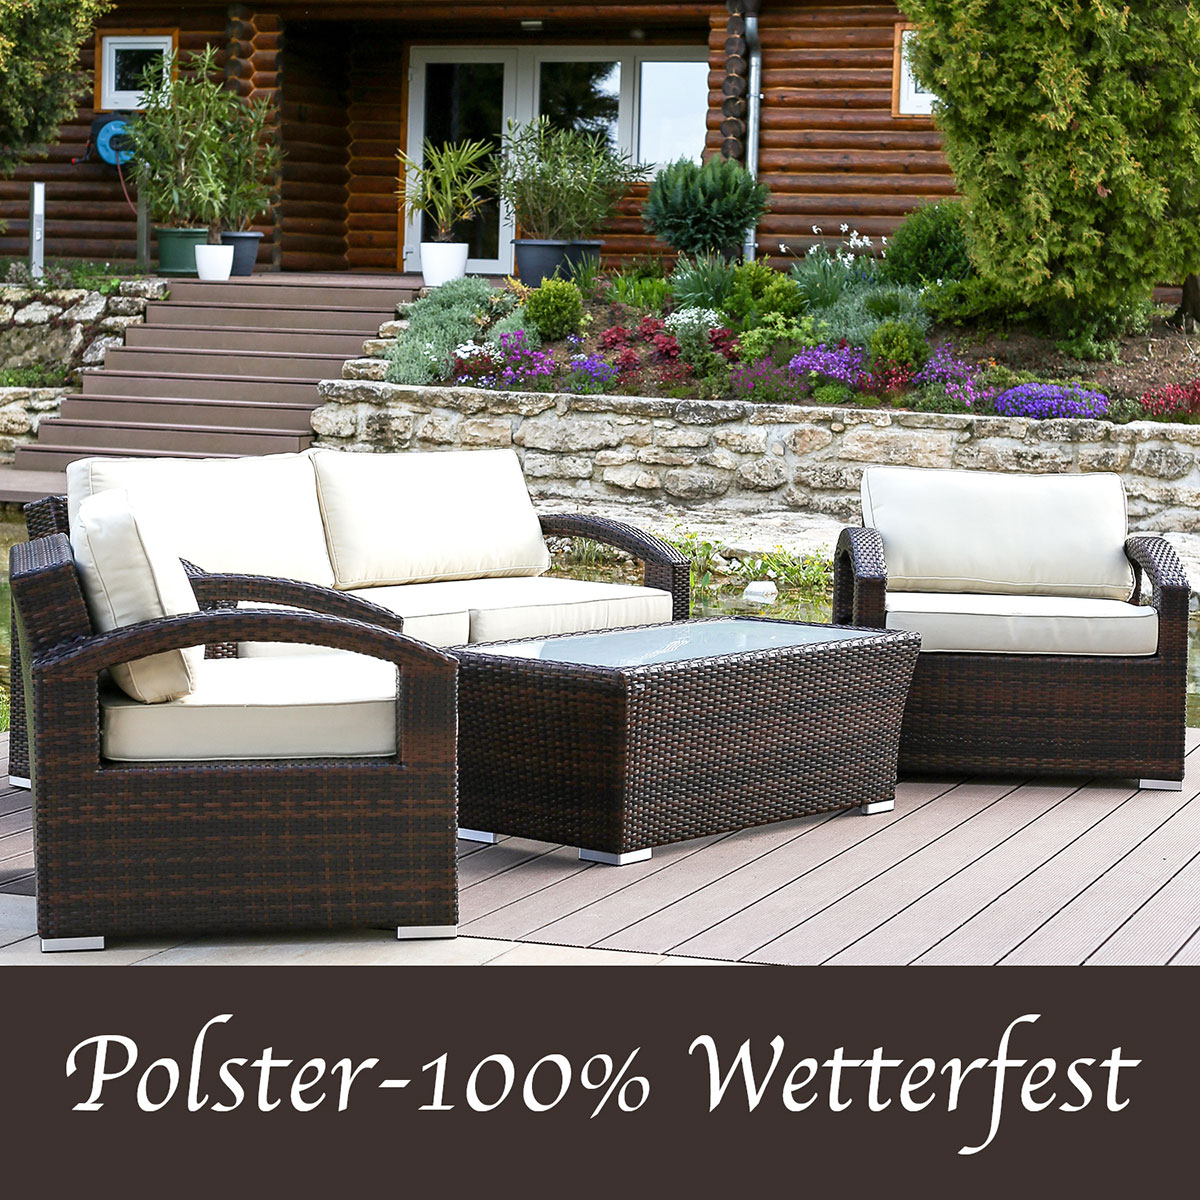 Terrassenmöbel lounge wetterfest  Polyrattan Gartenmöbel Lounge - Lounge Möbel, Lounge Set ...